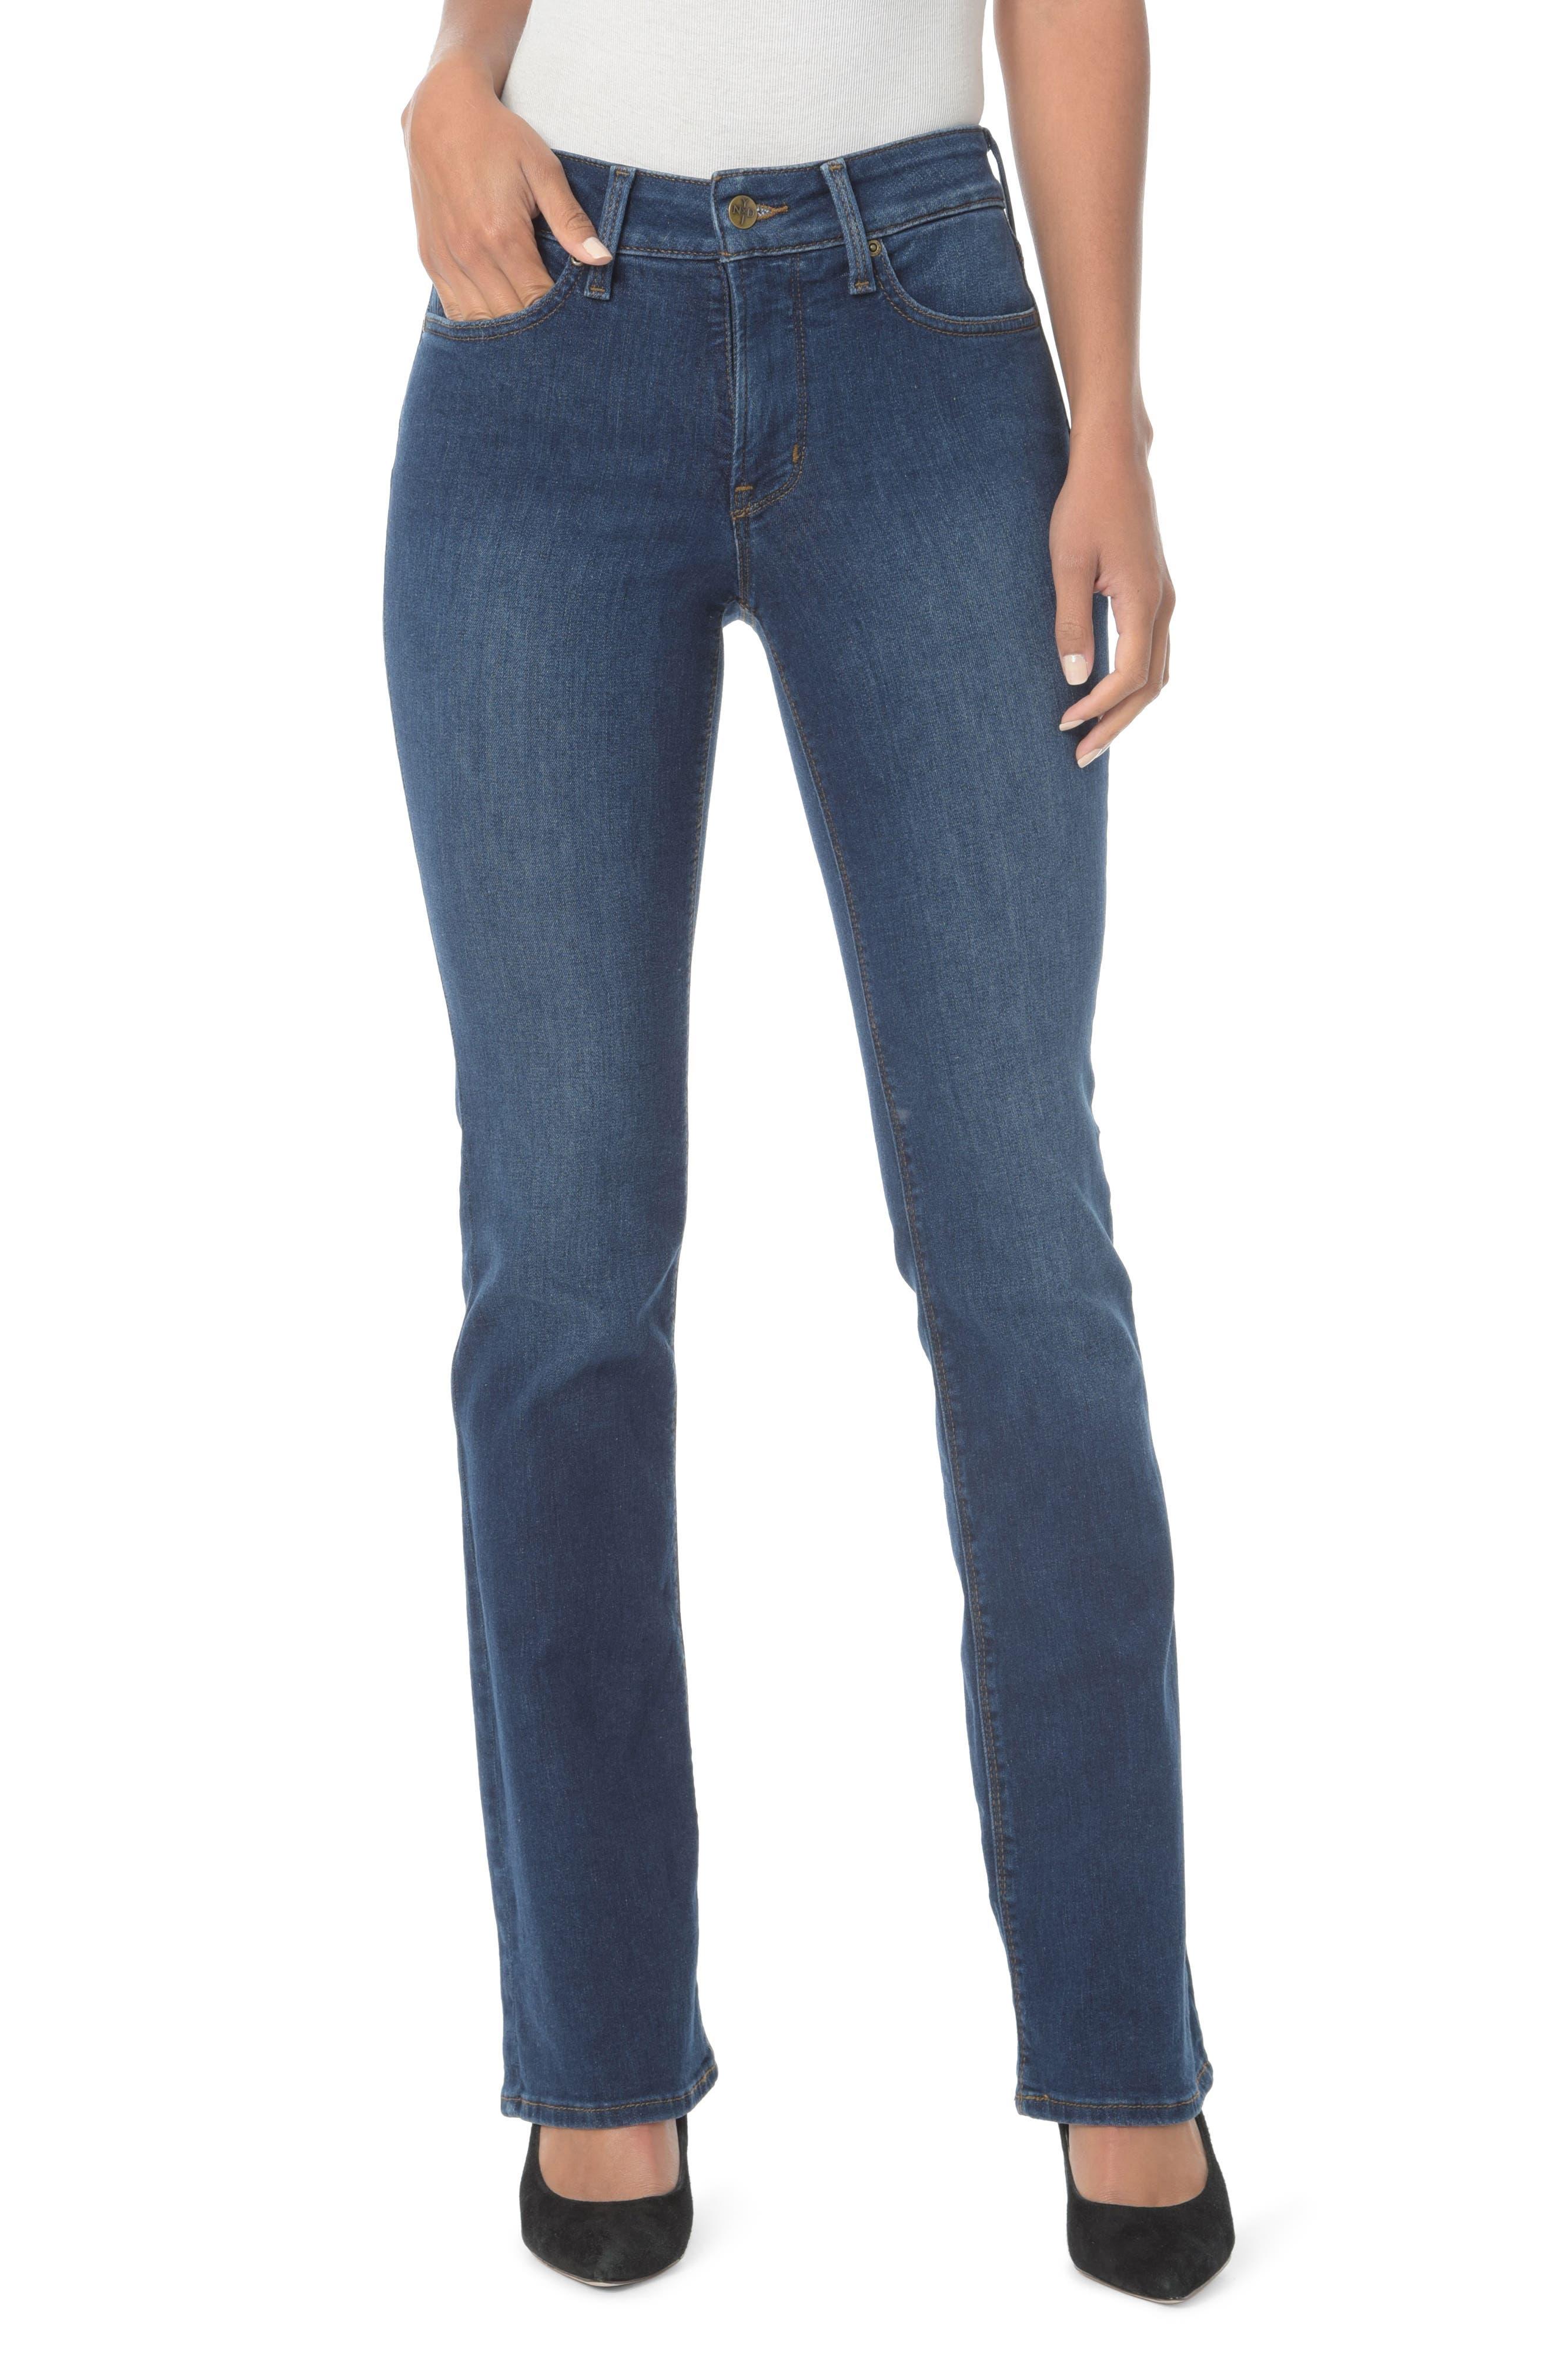 Women's NYDJ Barbara High Waist Stretch Bootcut Jeans